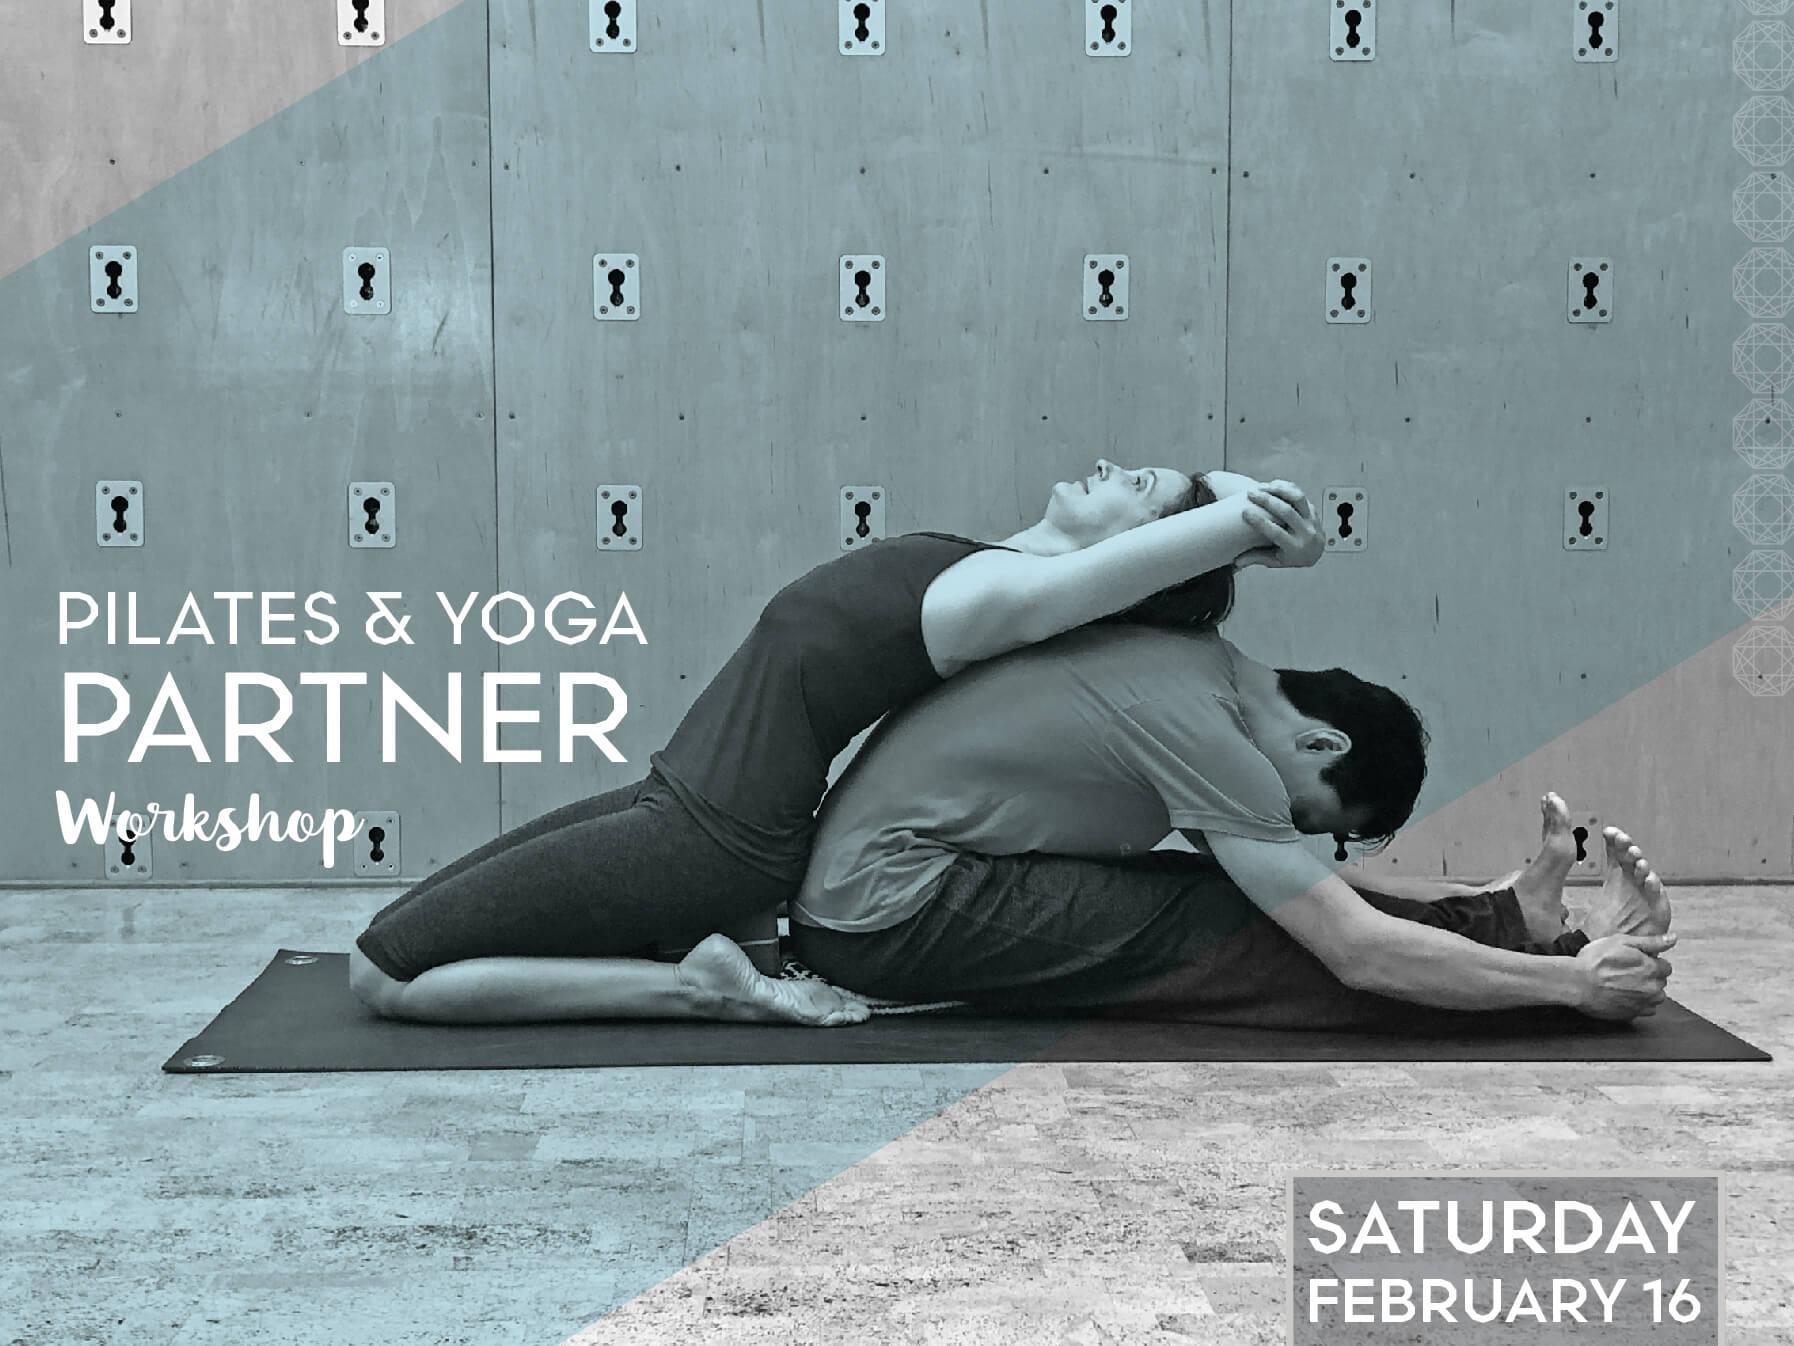 Pilates and Yoga Partner Workshop